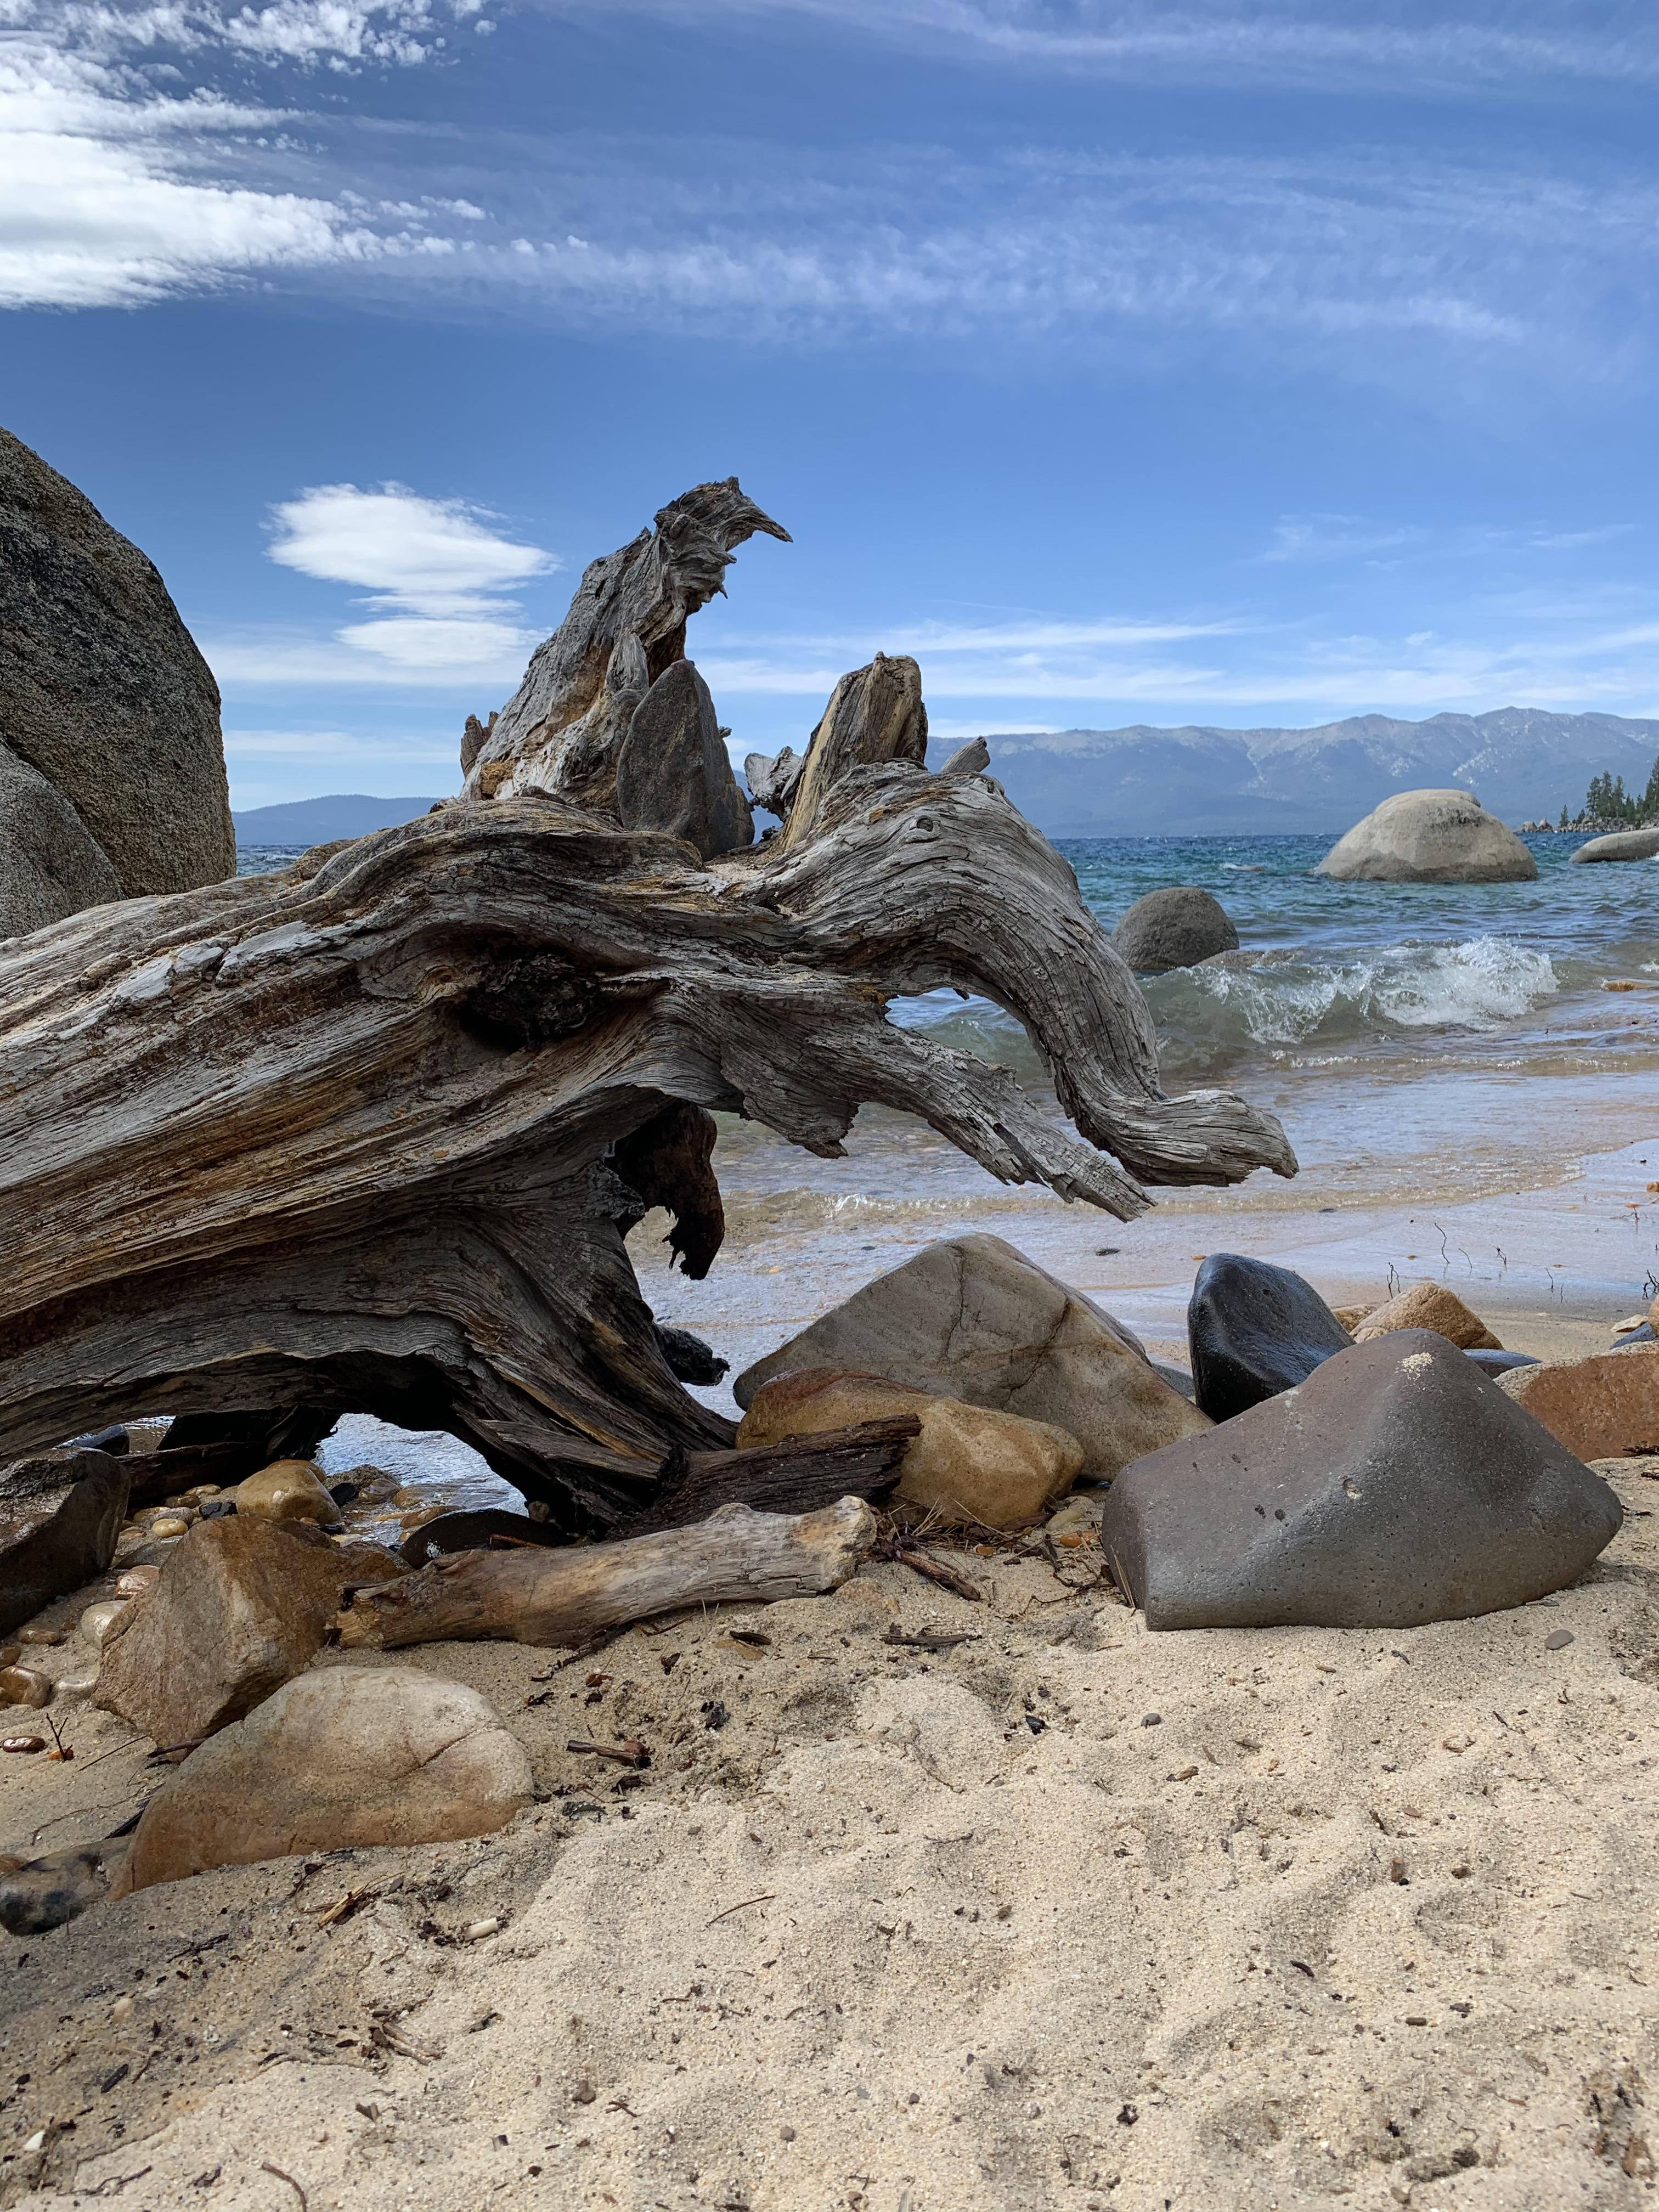 Whale Beach Tahoe : whale, beach, tahoe, Stopped, Whales, Beach, Weekend!, Tahoe